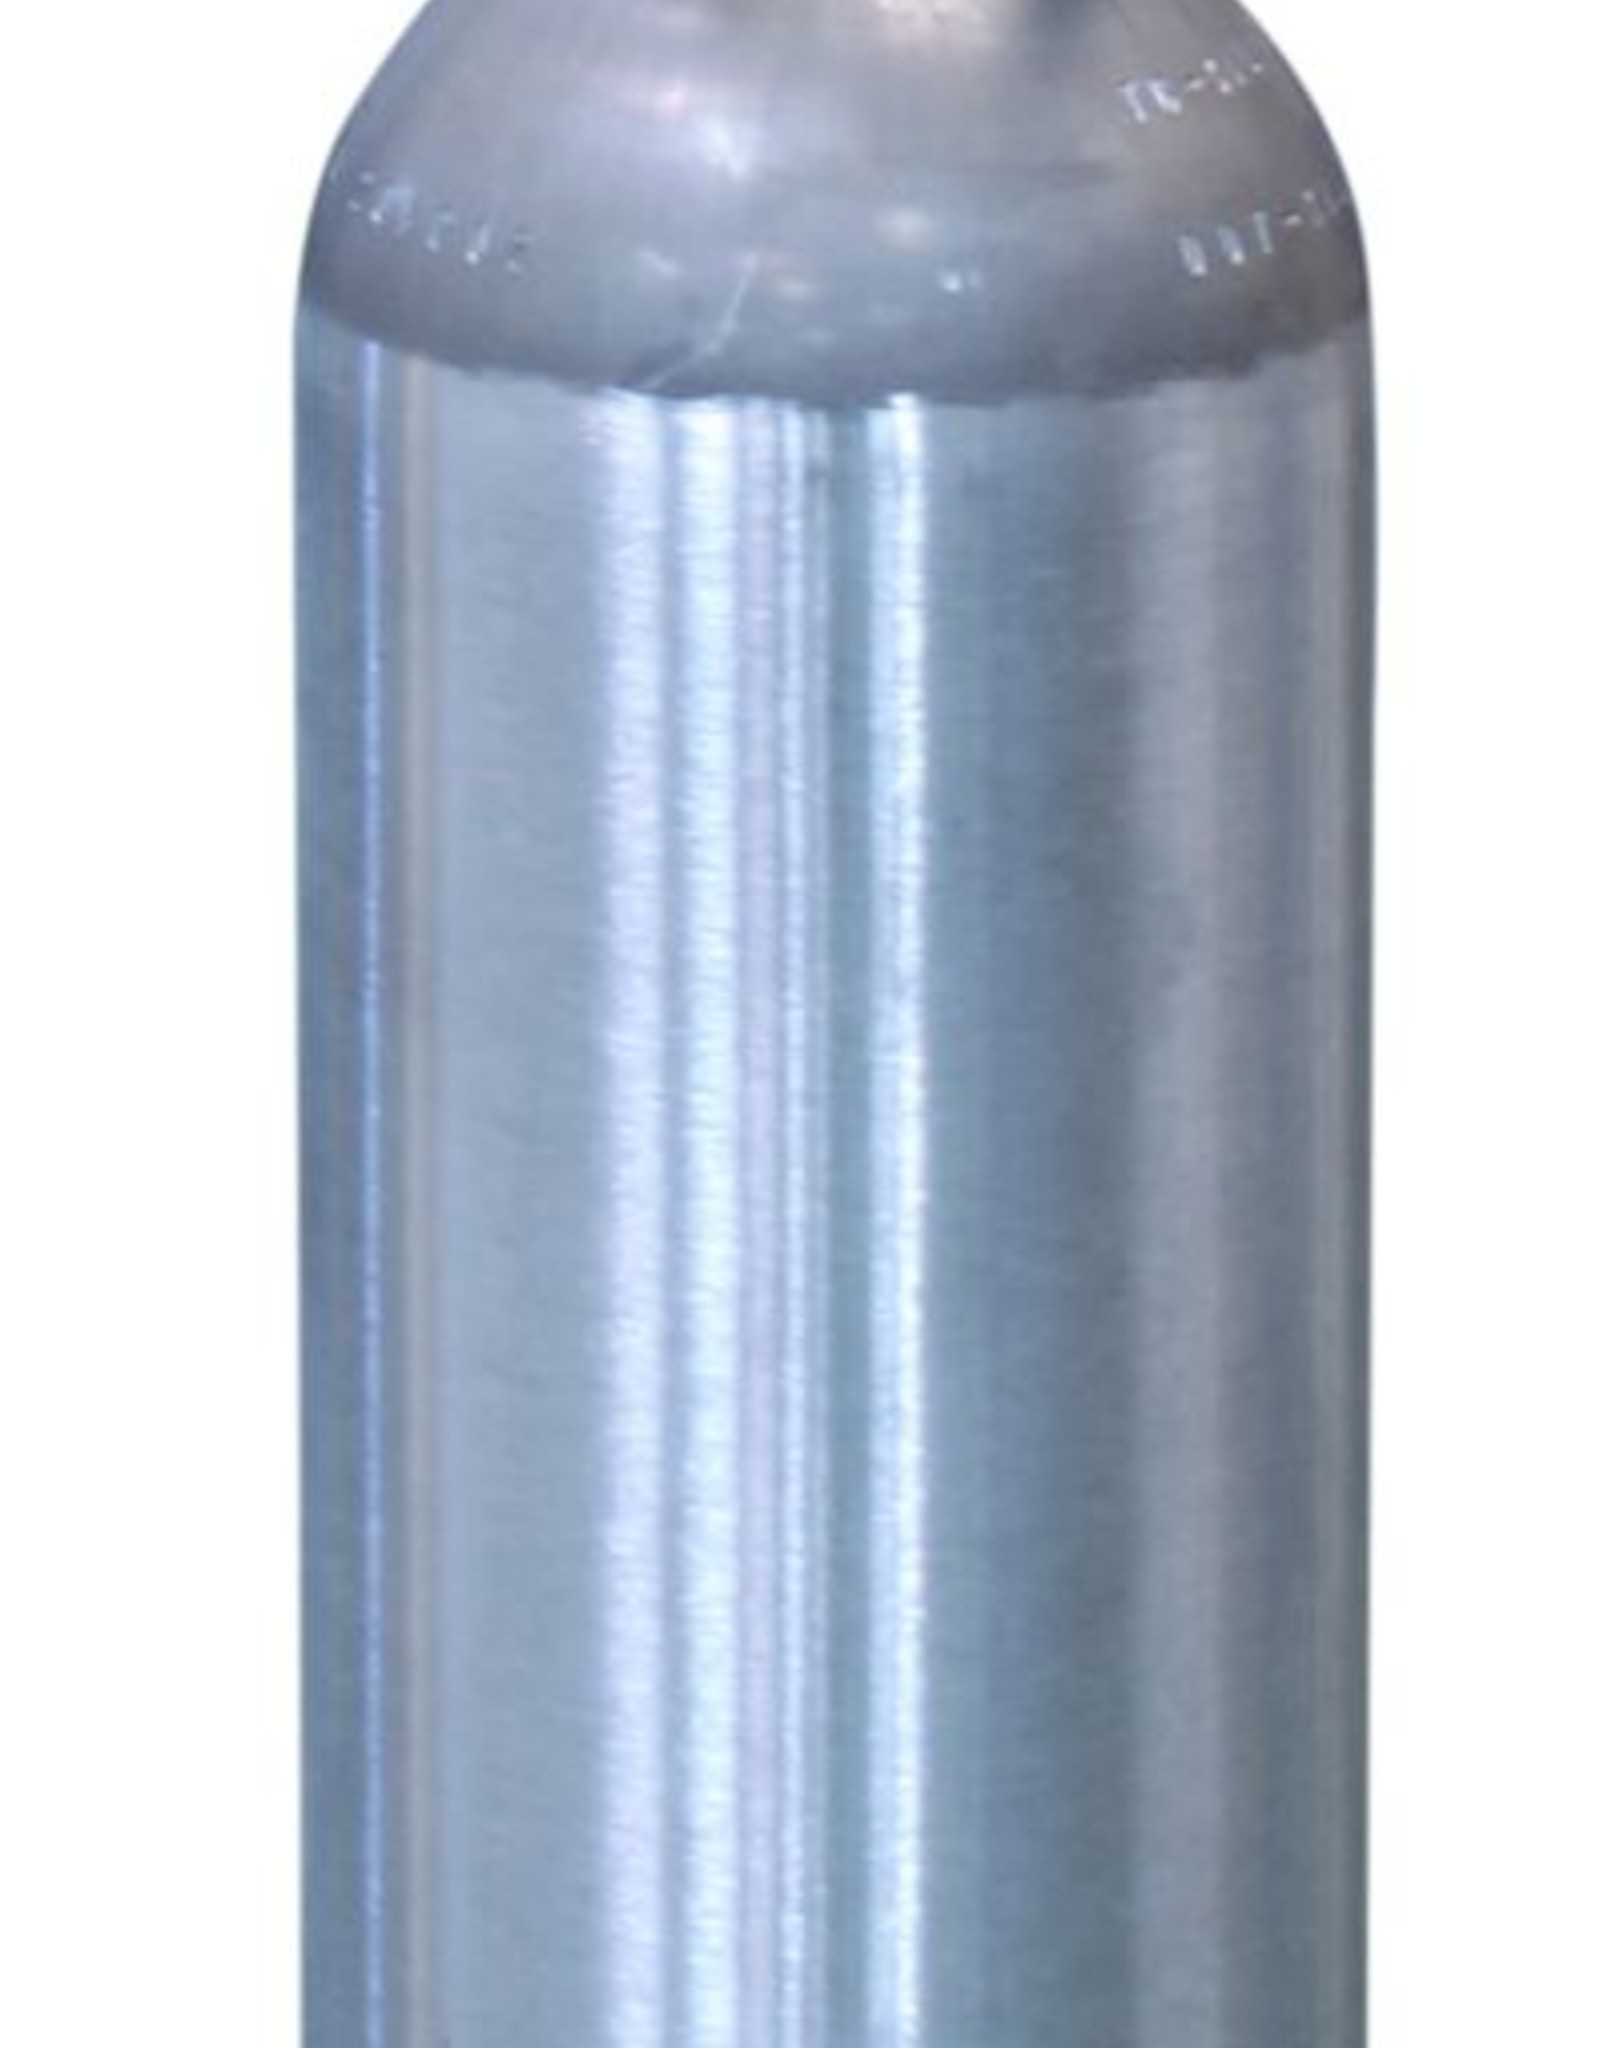 Cesco 20 POUND CO2 EXCHANGE